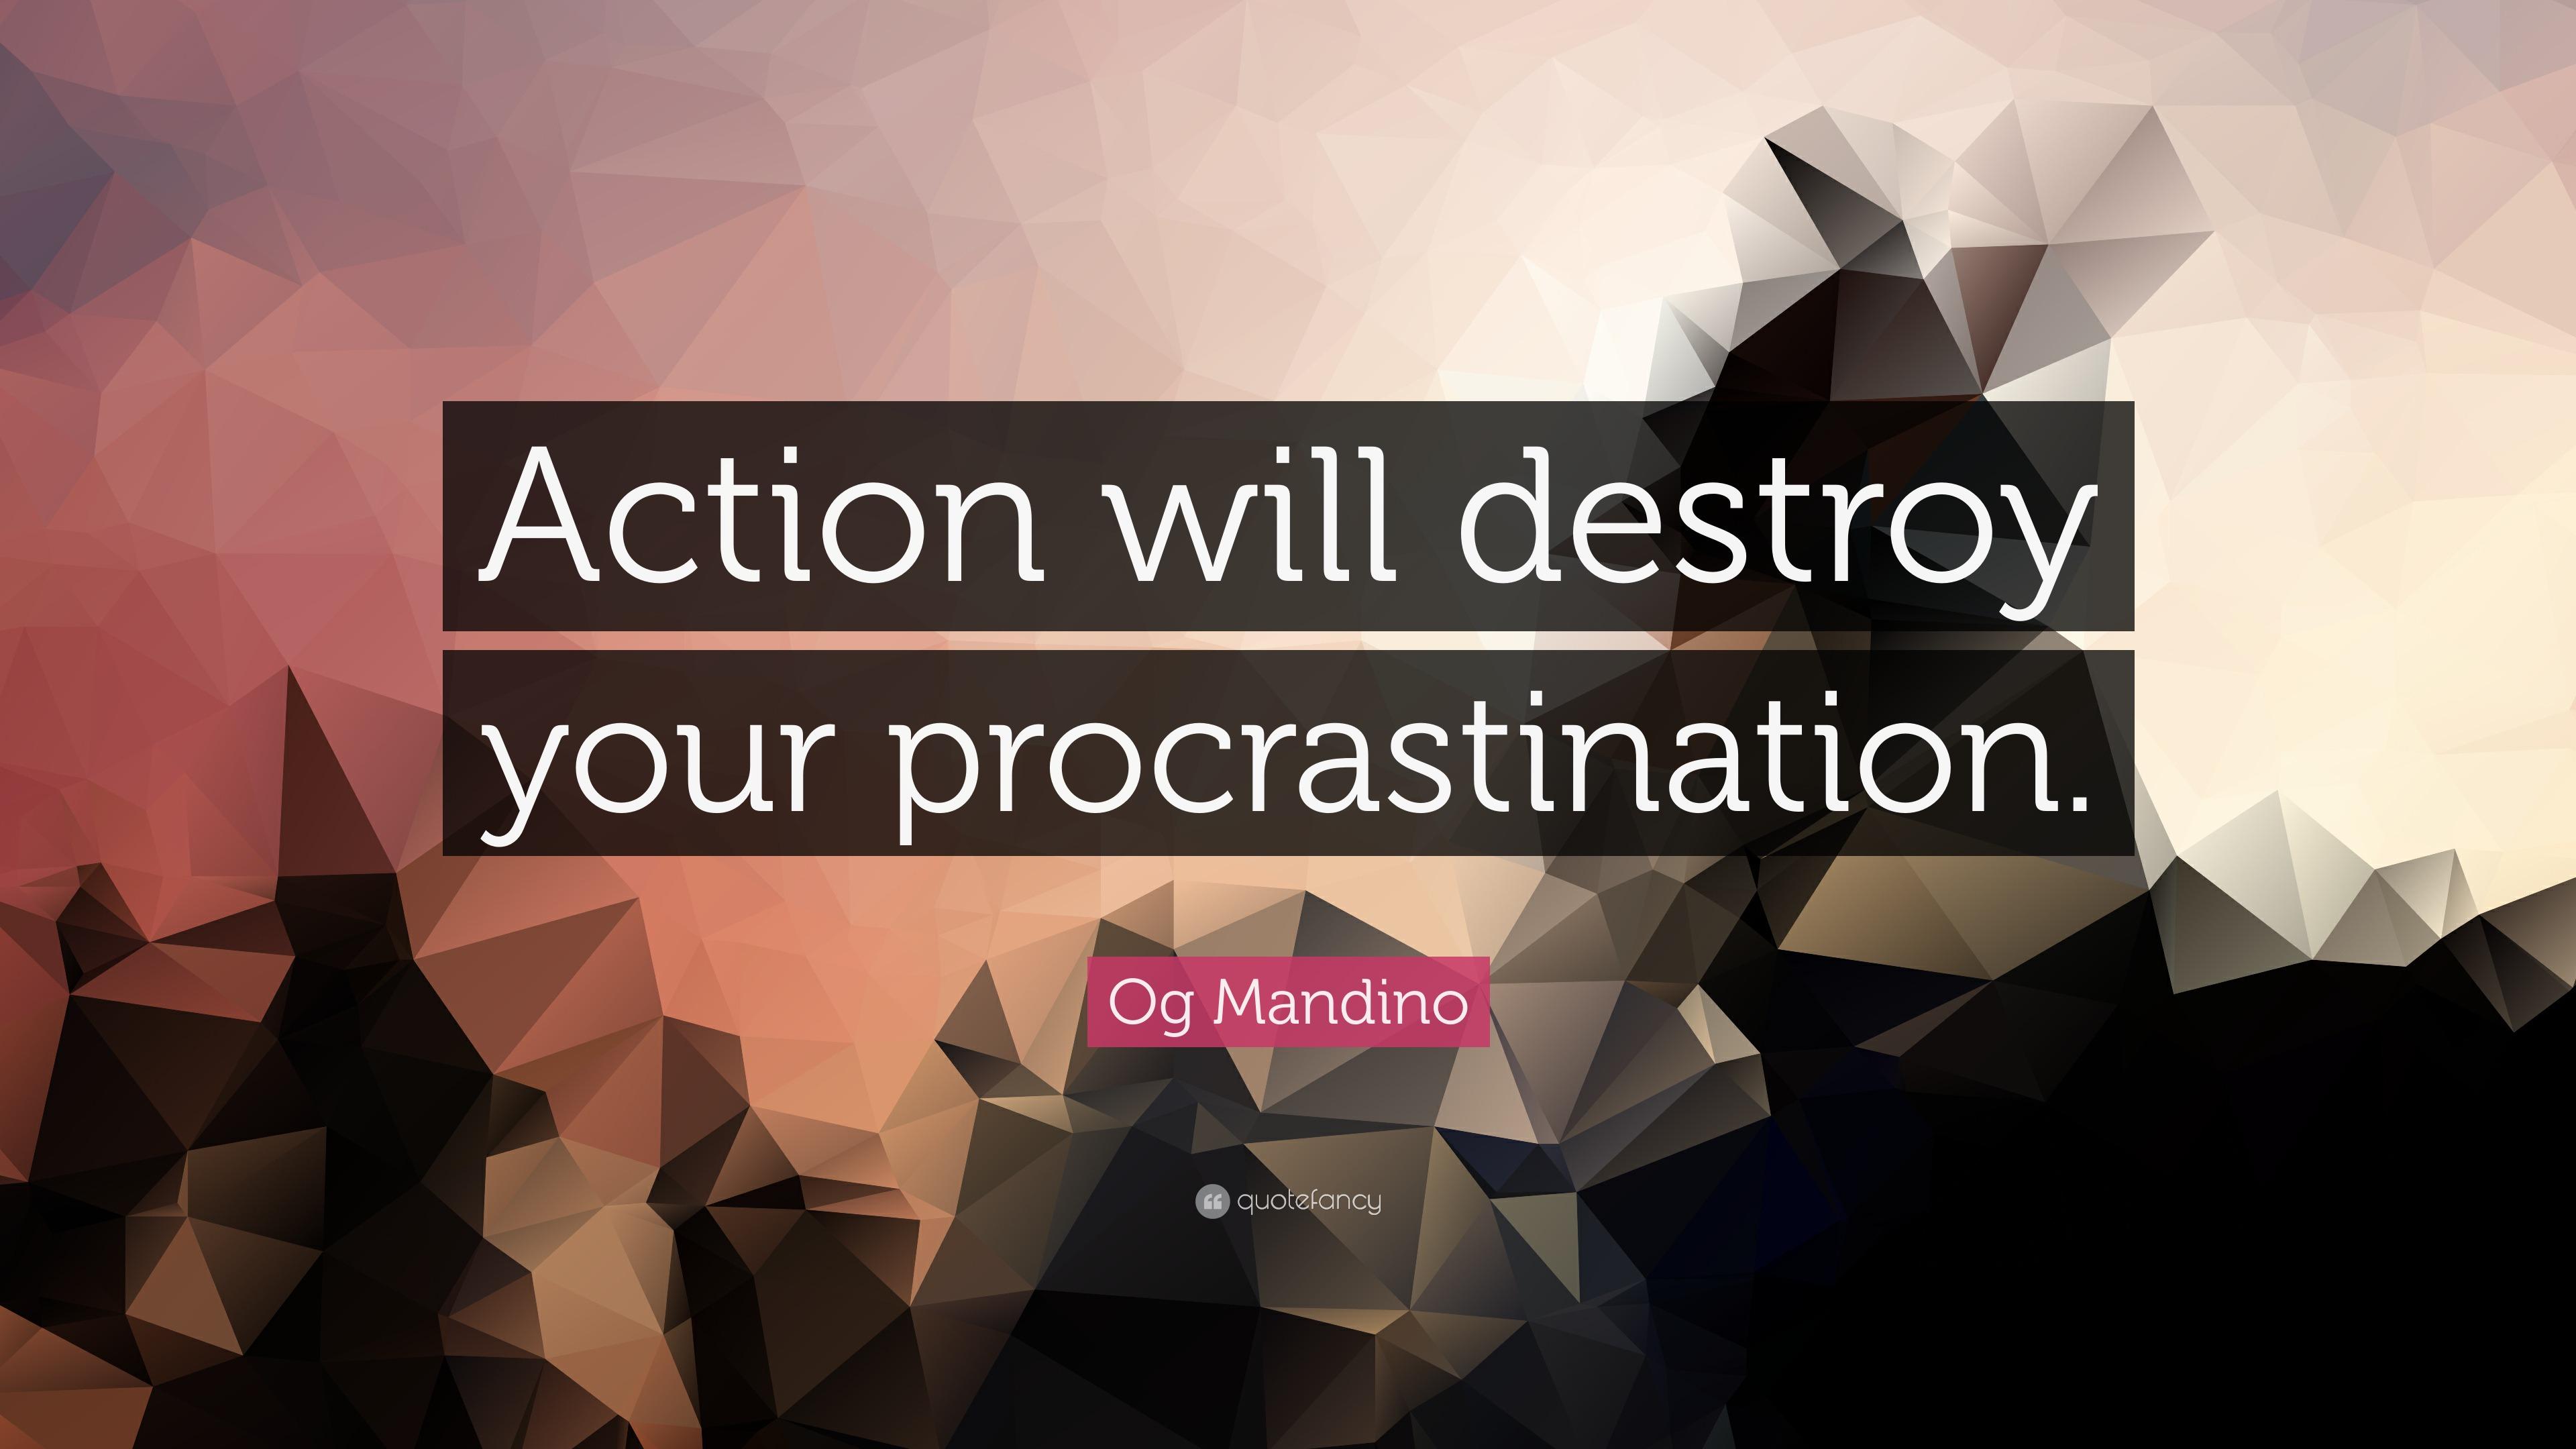 Procrastination and action